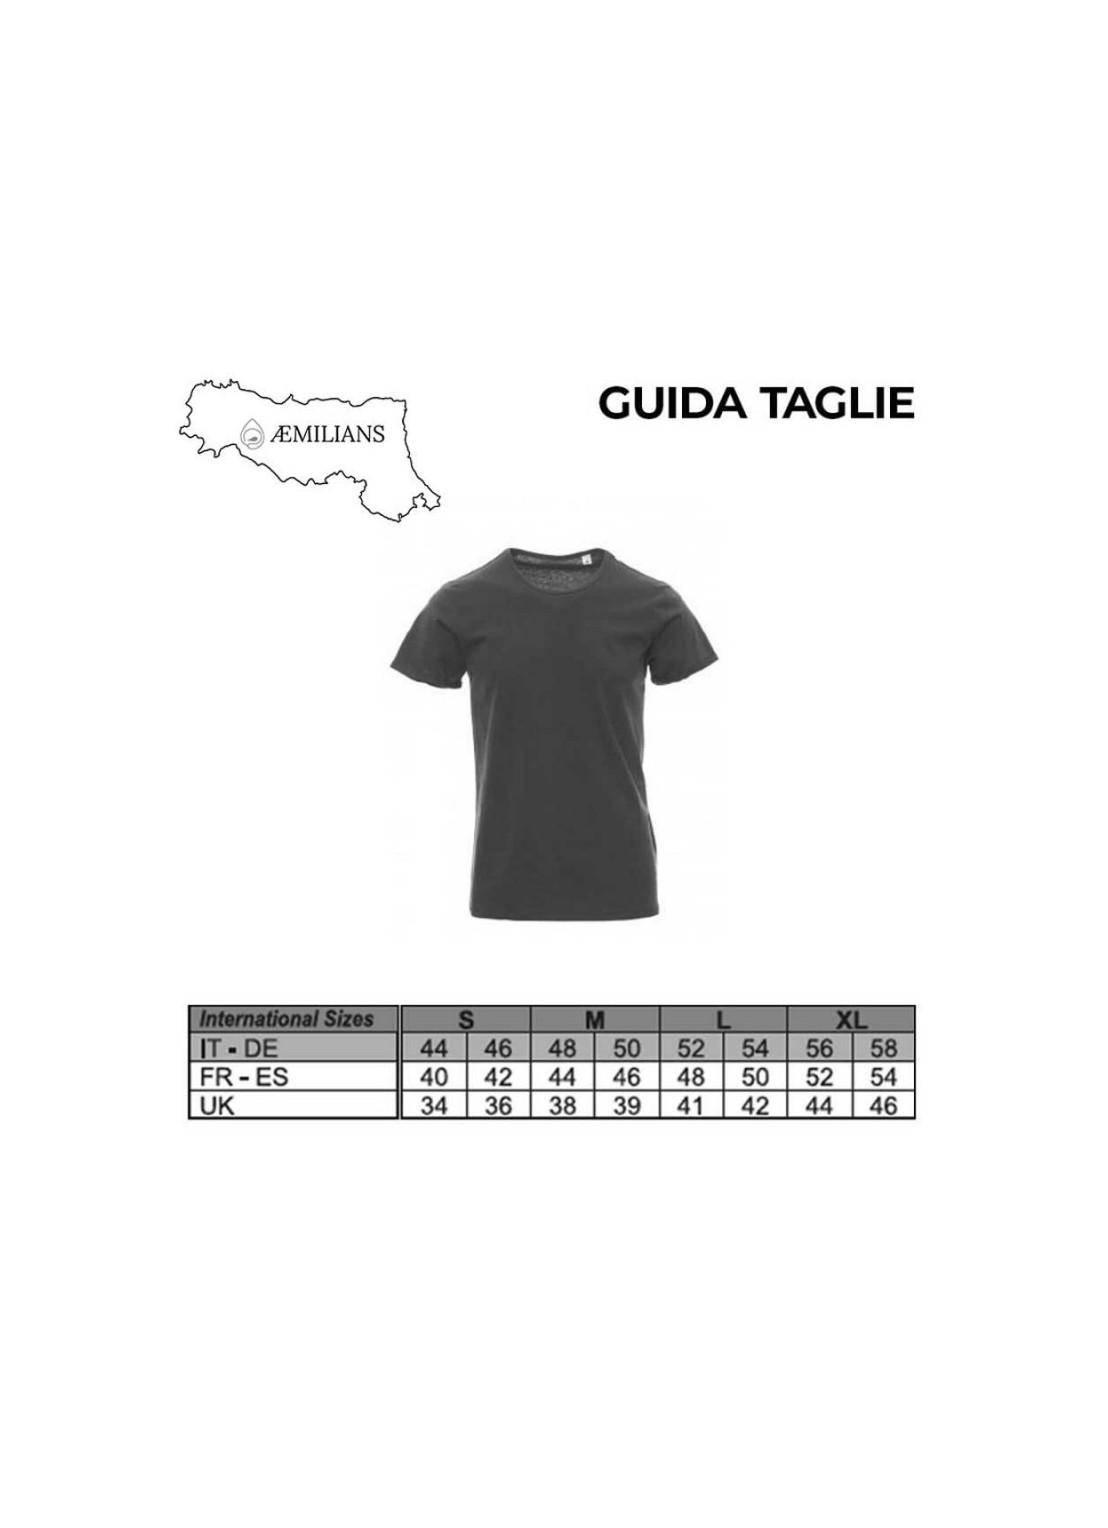 Ragazza Magica Bianca Shirt T Store Donna Maxdevil 8wnPON0kX